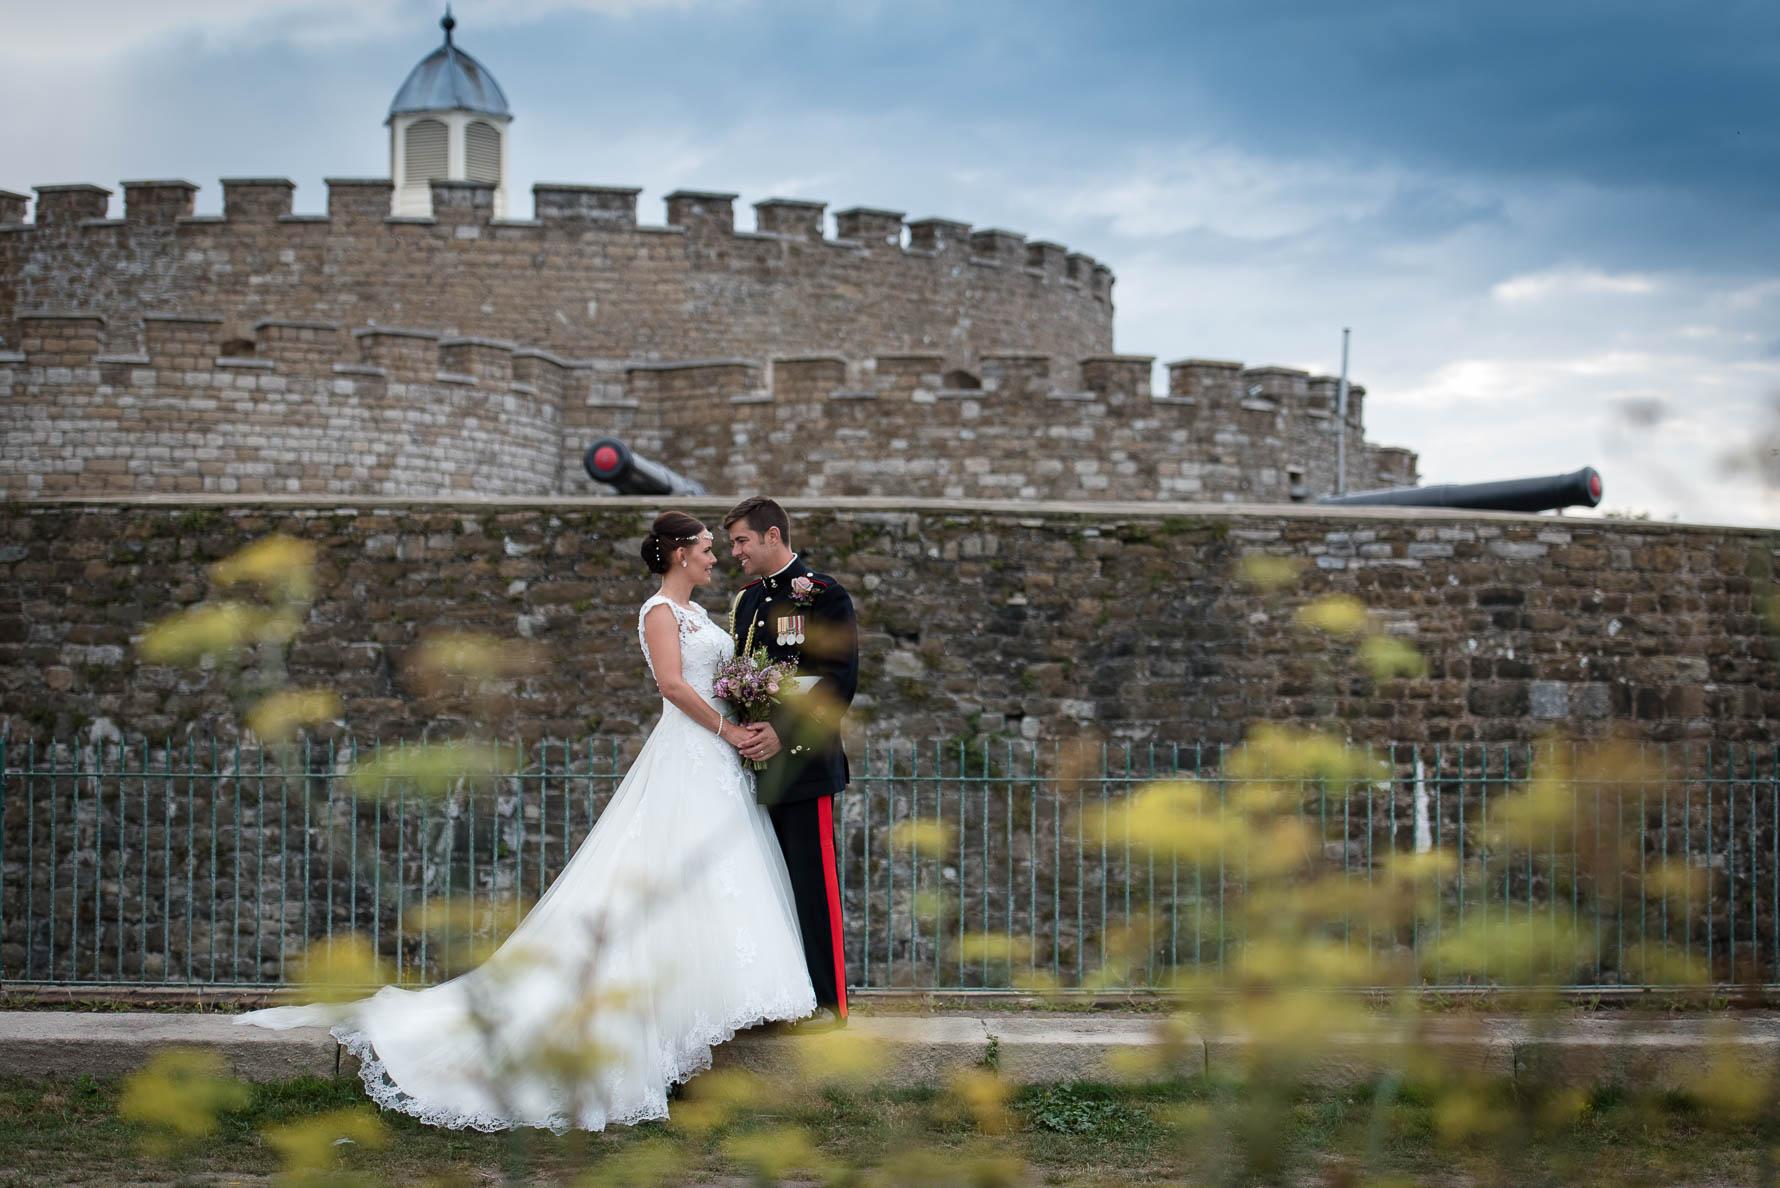 Wedding in Deal-5.jpg